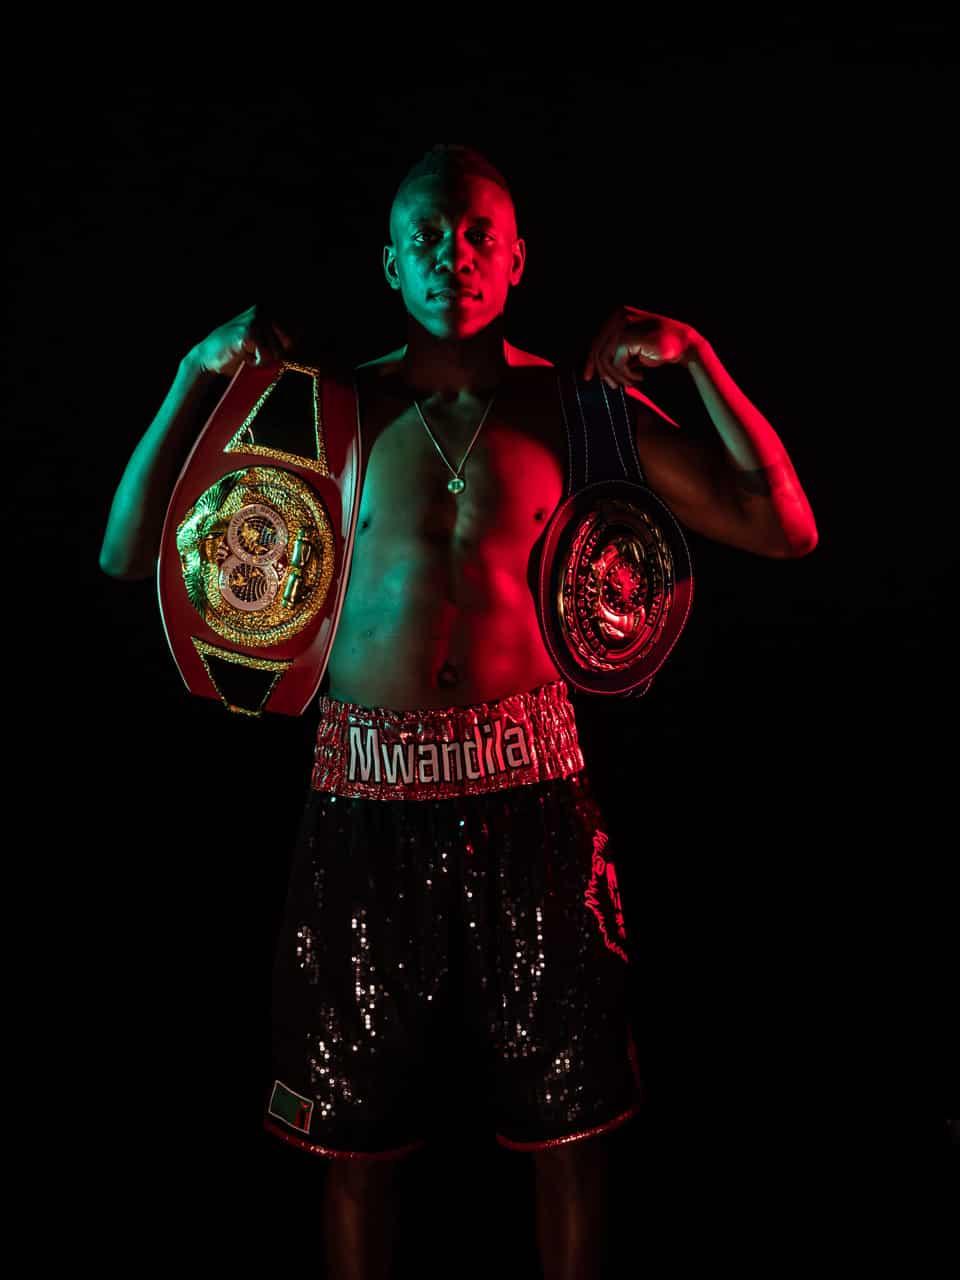 Professionel bokser Enock Mwandila Poulsen